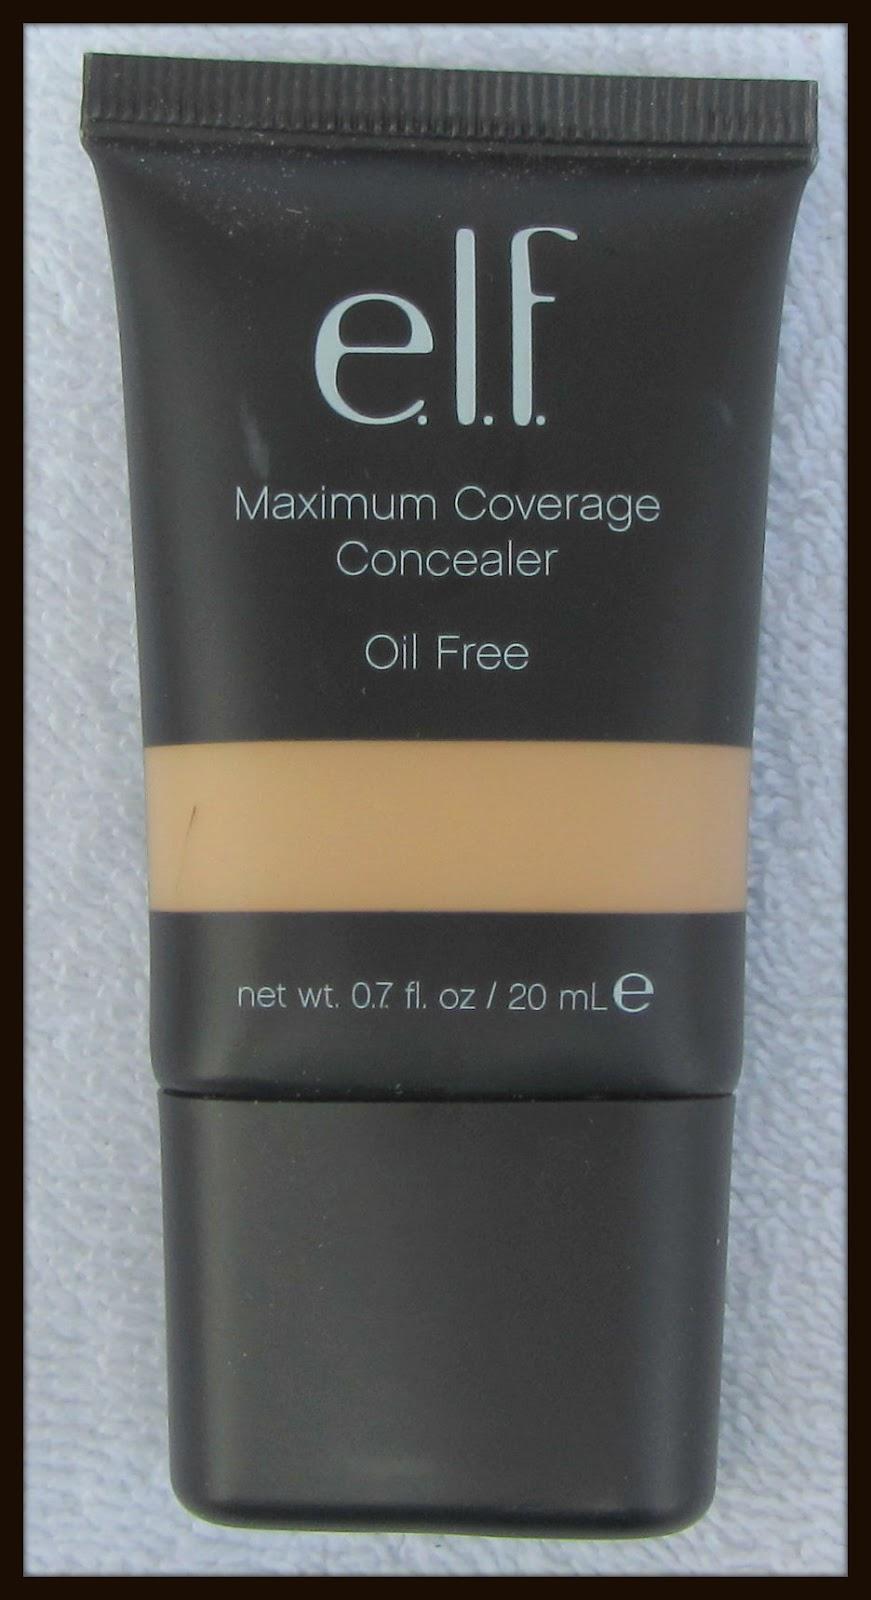 *Ninas Bargain Beauty*: ELF Maximum Coverage Concealer in